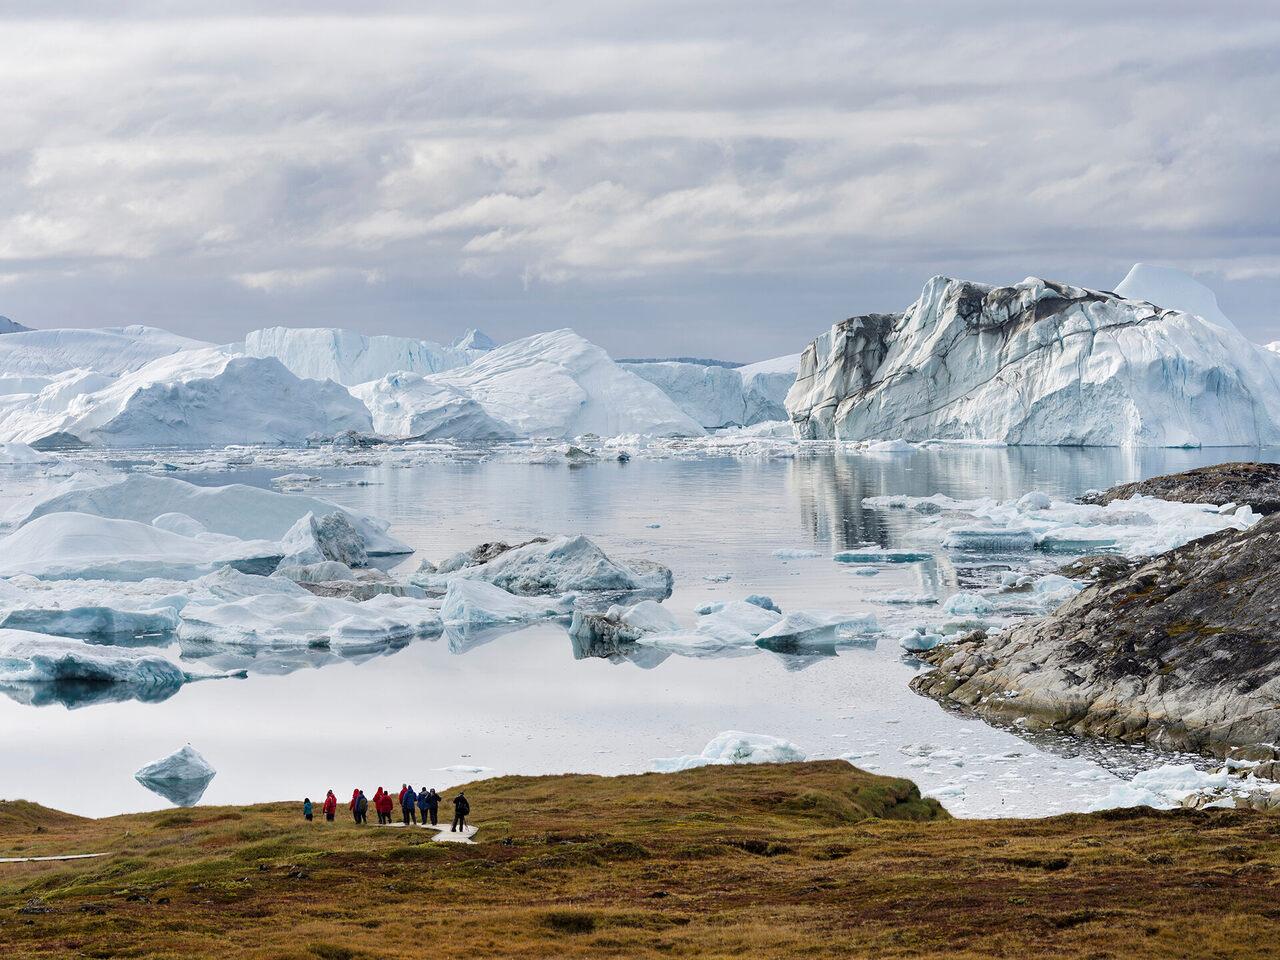 Tourists admiring the Ilulissat Icefjord.